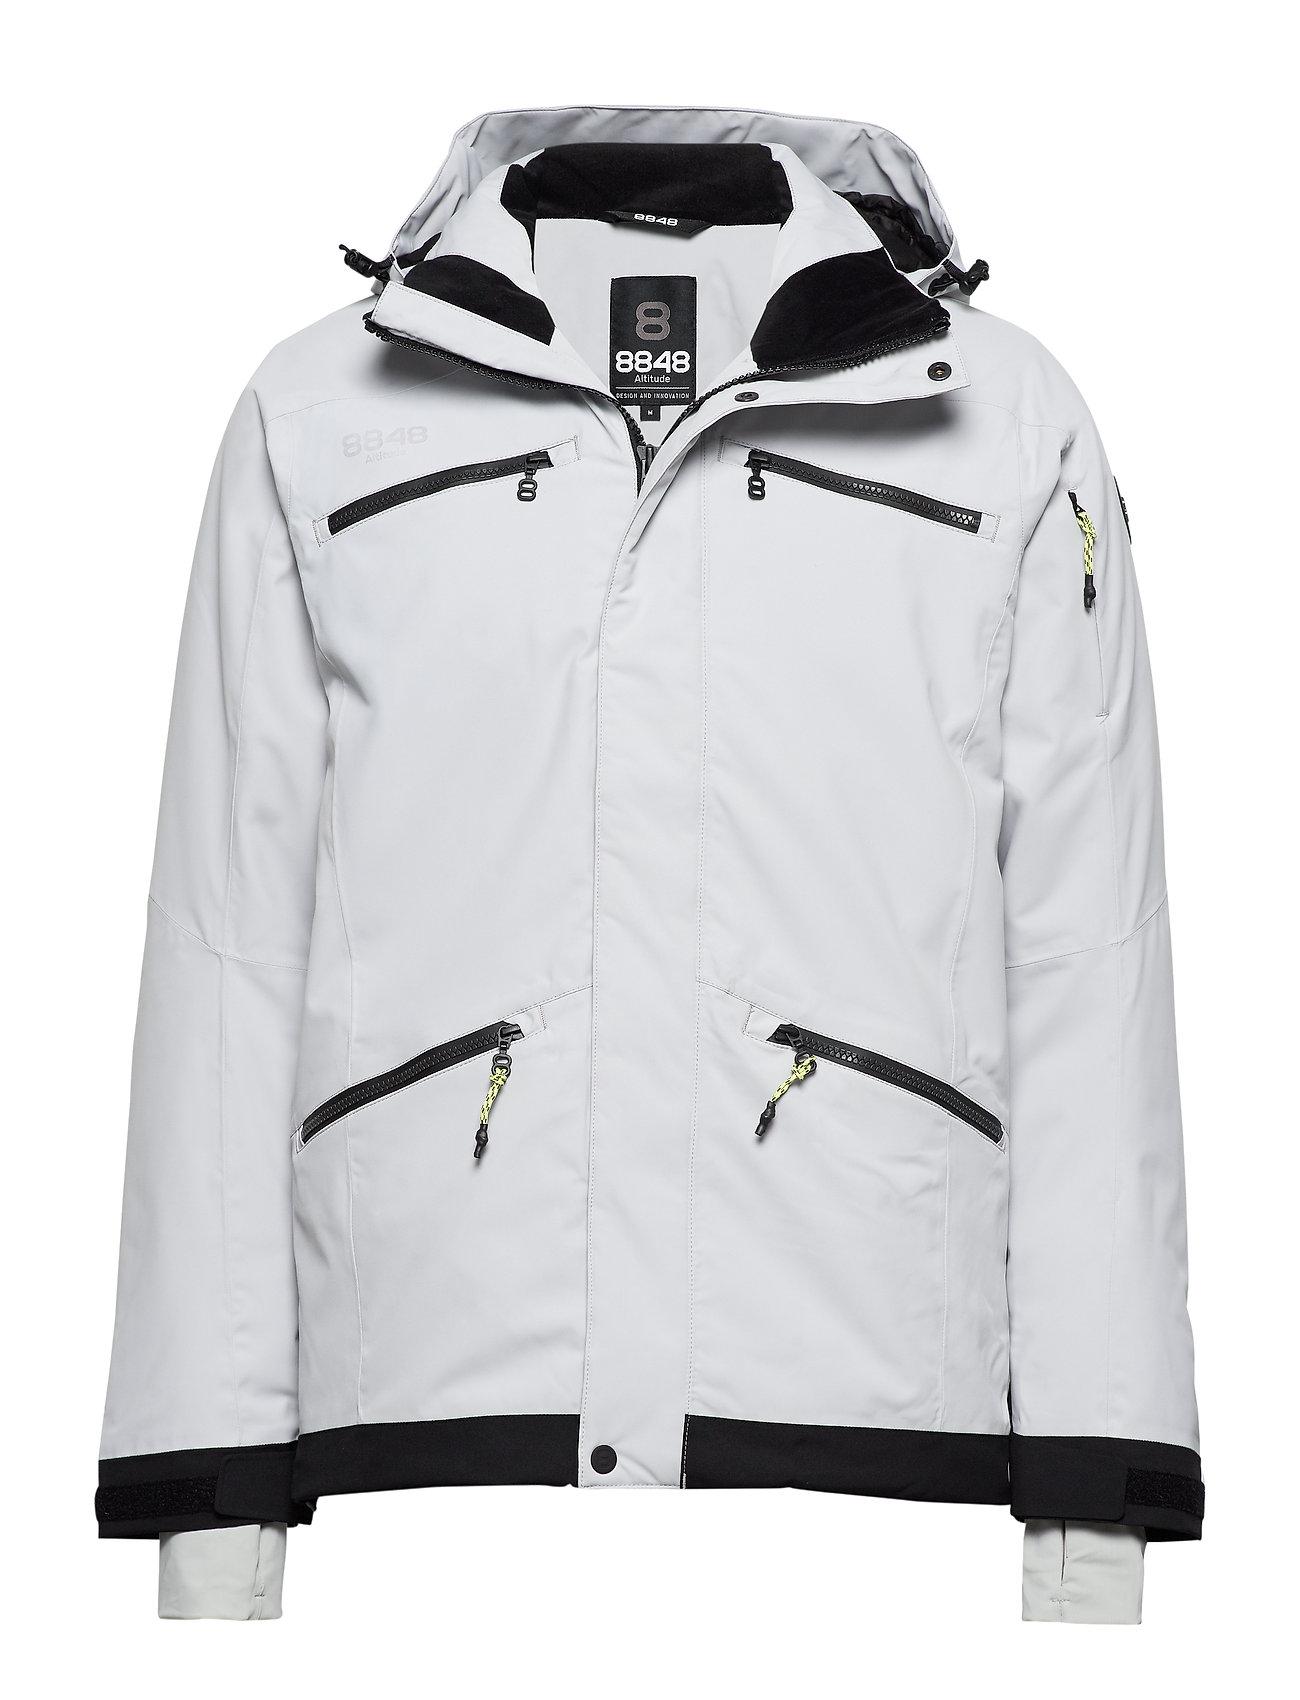 8848 Altitude Fairbank Jacket - LT GREY